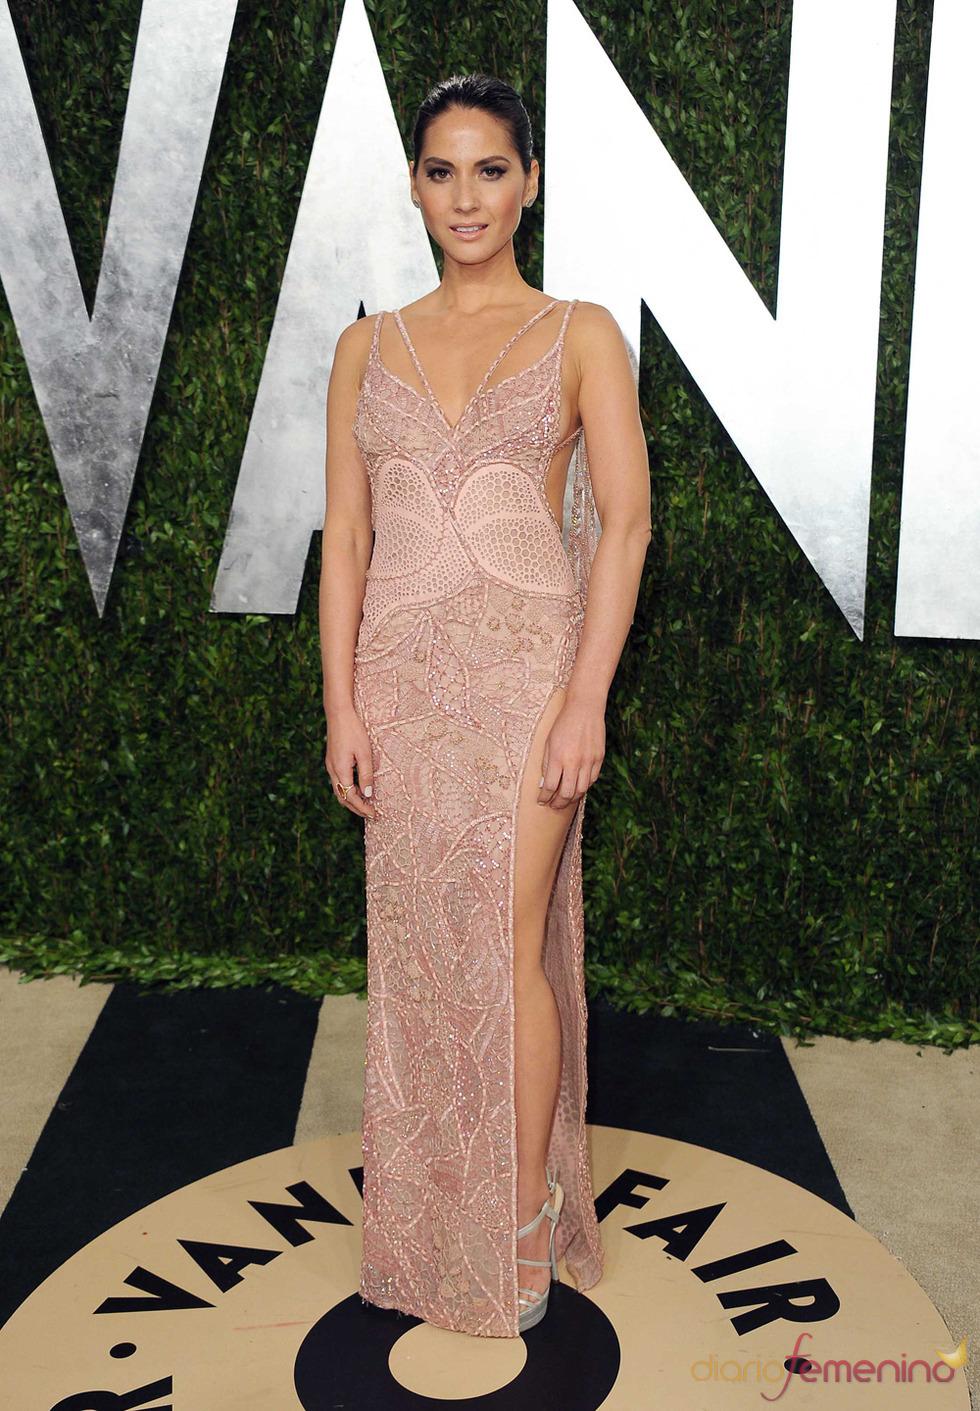 Olivia Munn en la fiesta de Vanity celebrada tras los Oscar 2013